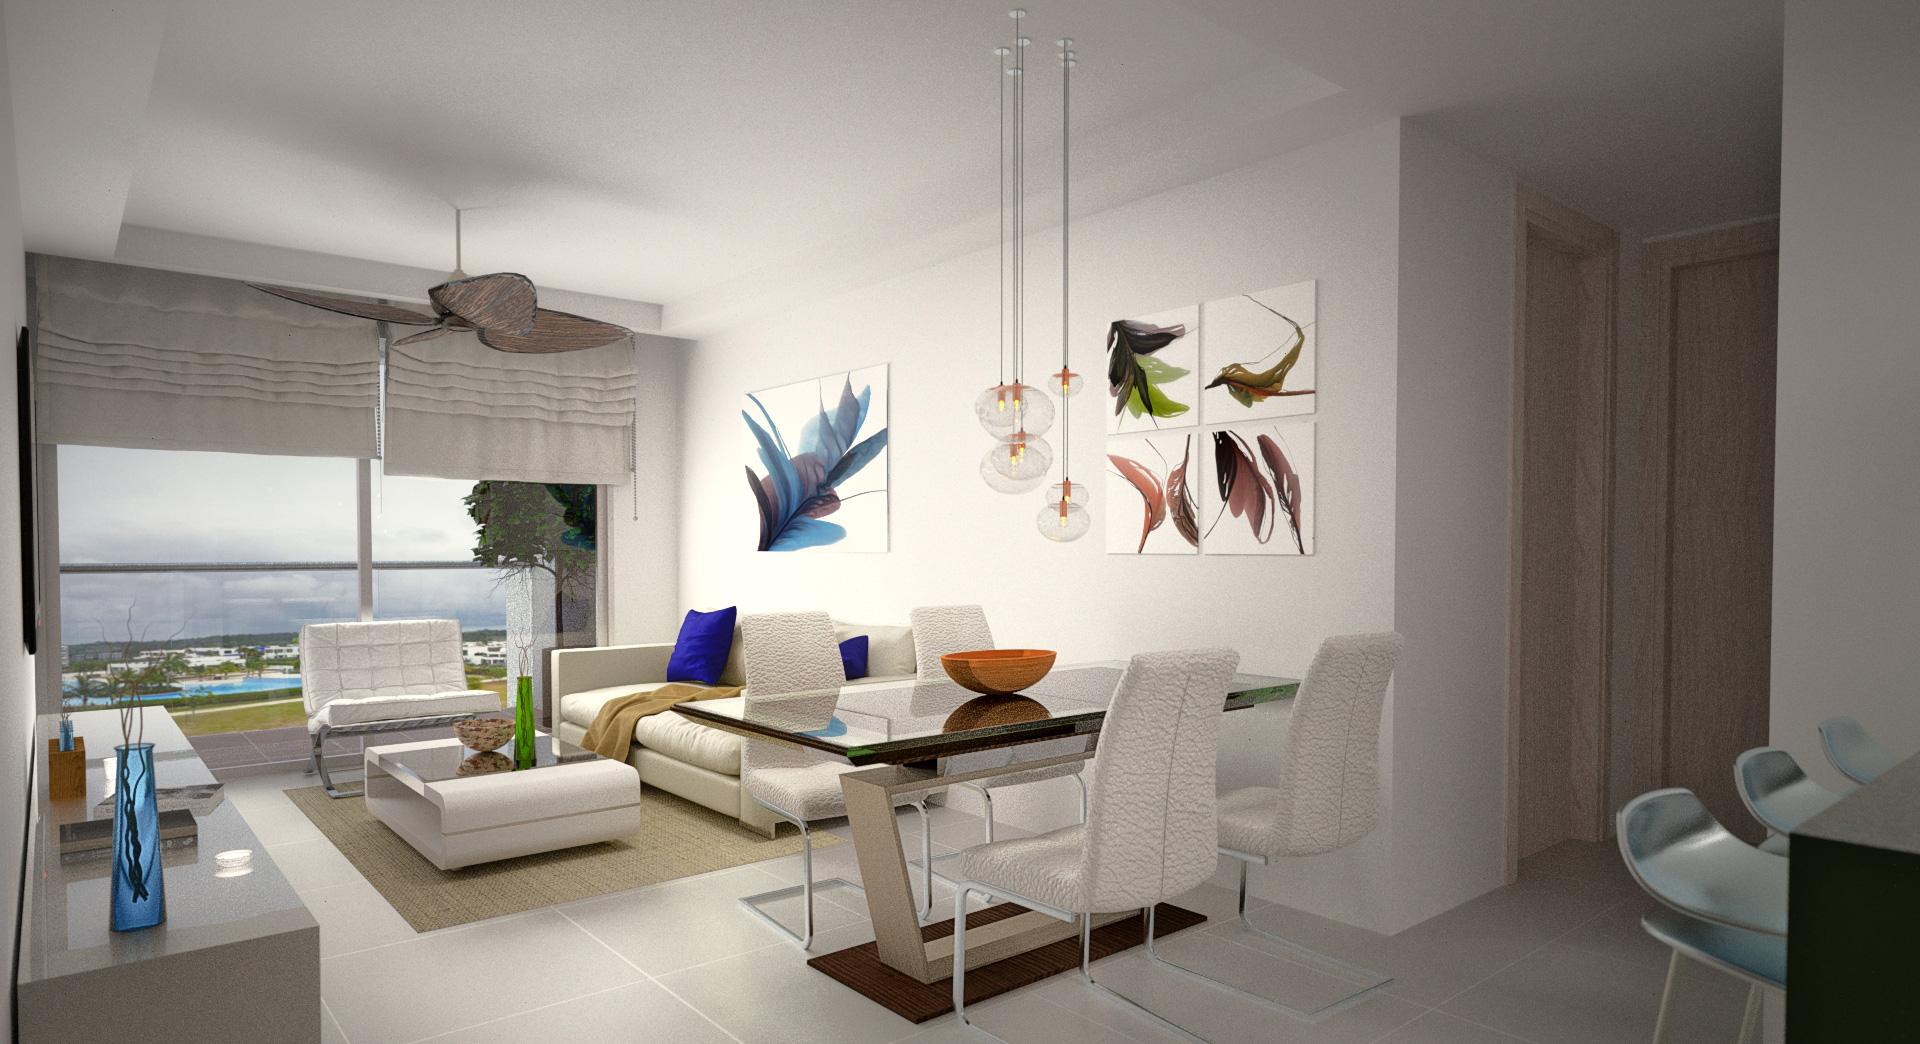 Barceloneta magna apartamentos en venta cartagena de indias zona norte anillo vial - Apartamentos en la barceloneta ...